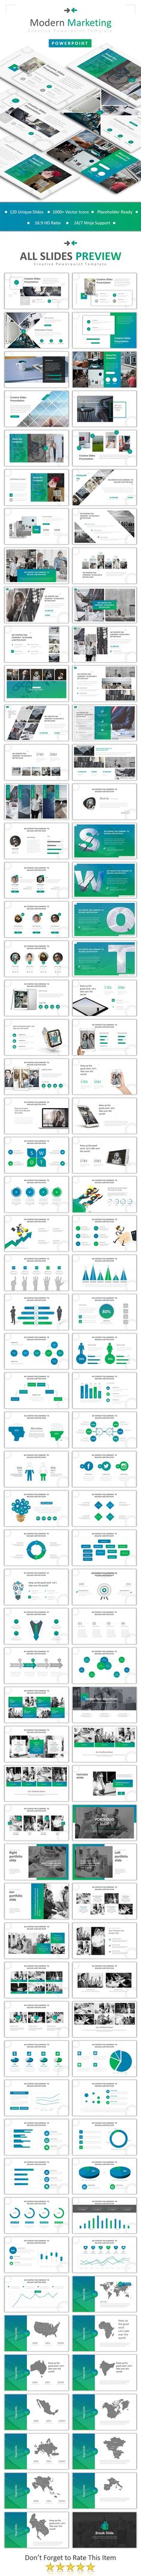 Modern Marketing Powerpoint - Business PowerPoint Templates